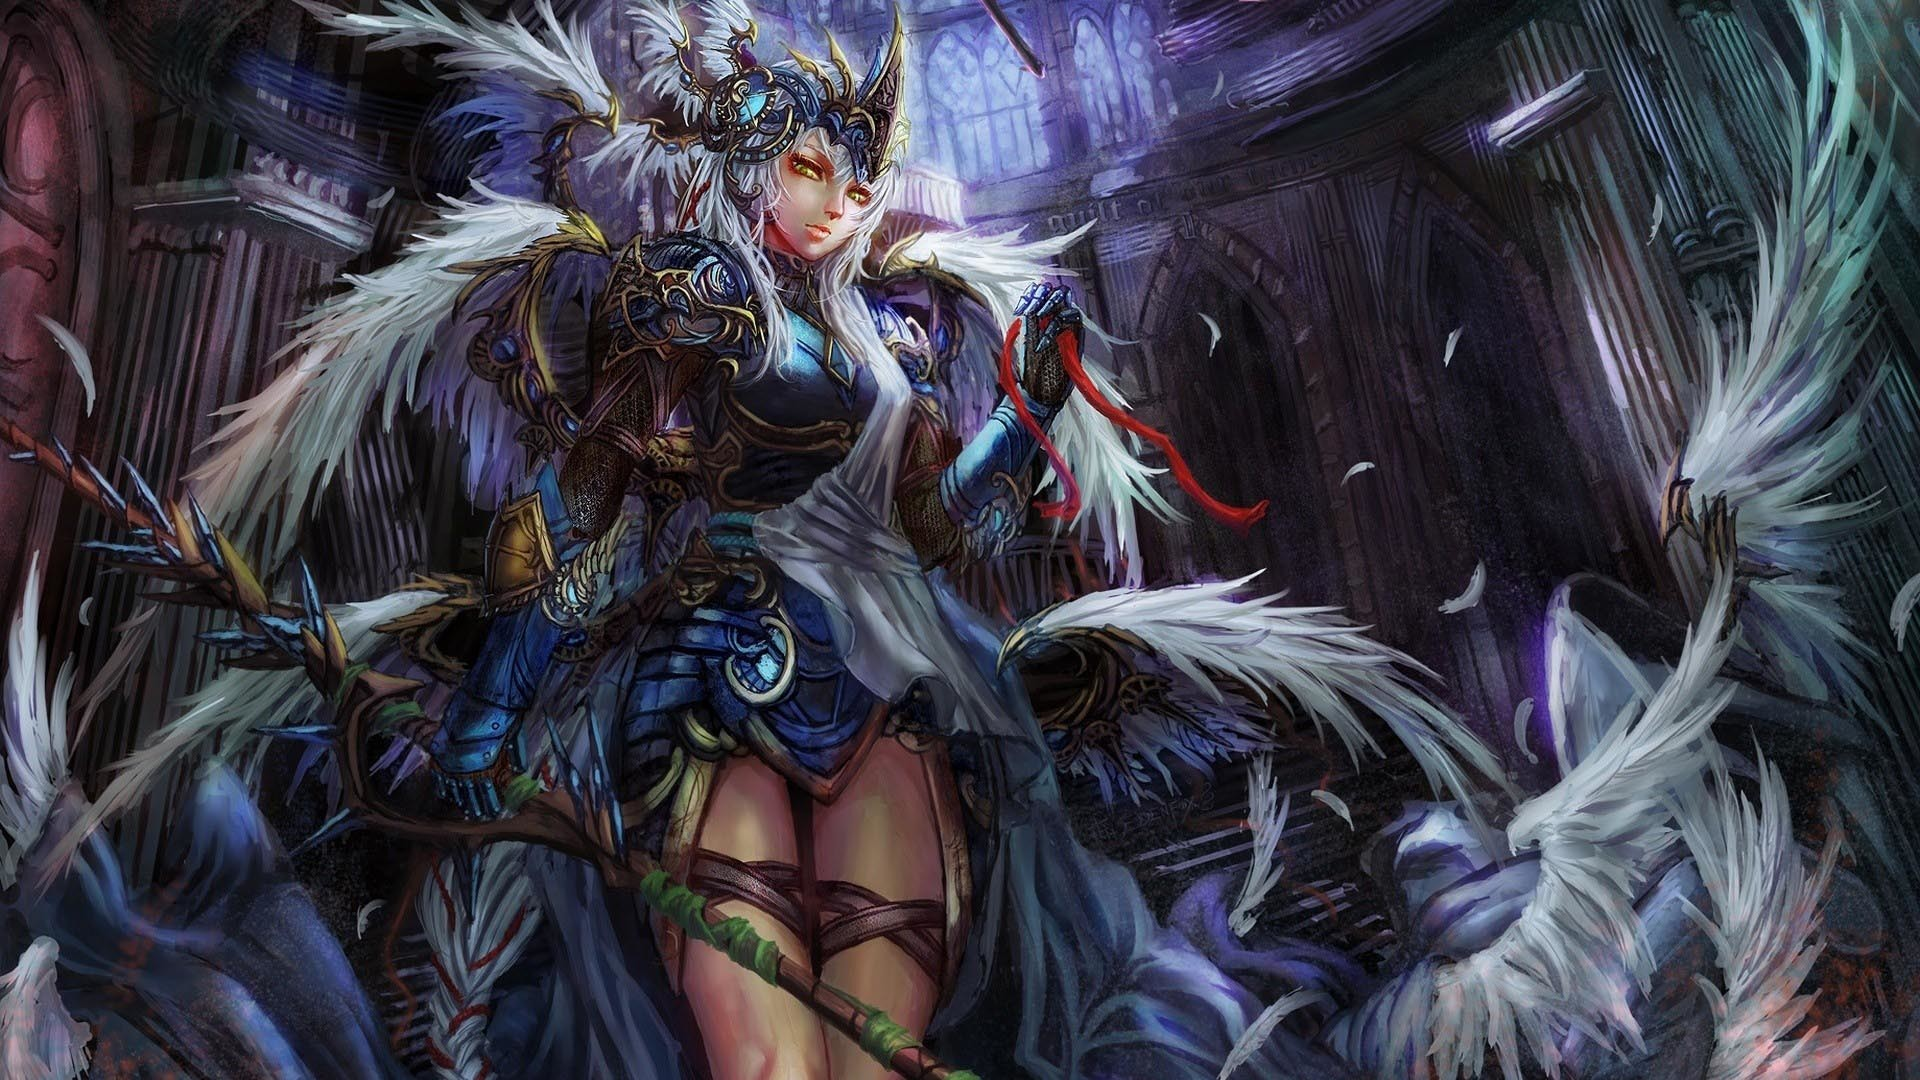 Anime Angel Warriors Wallpaper – image #728621